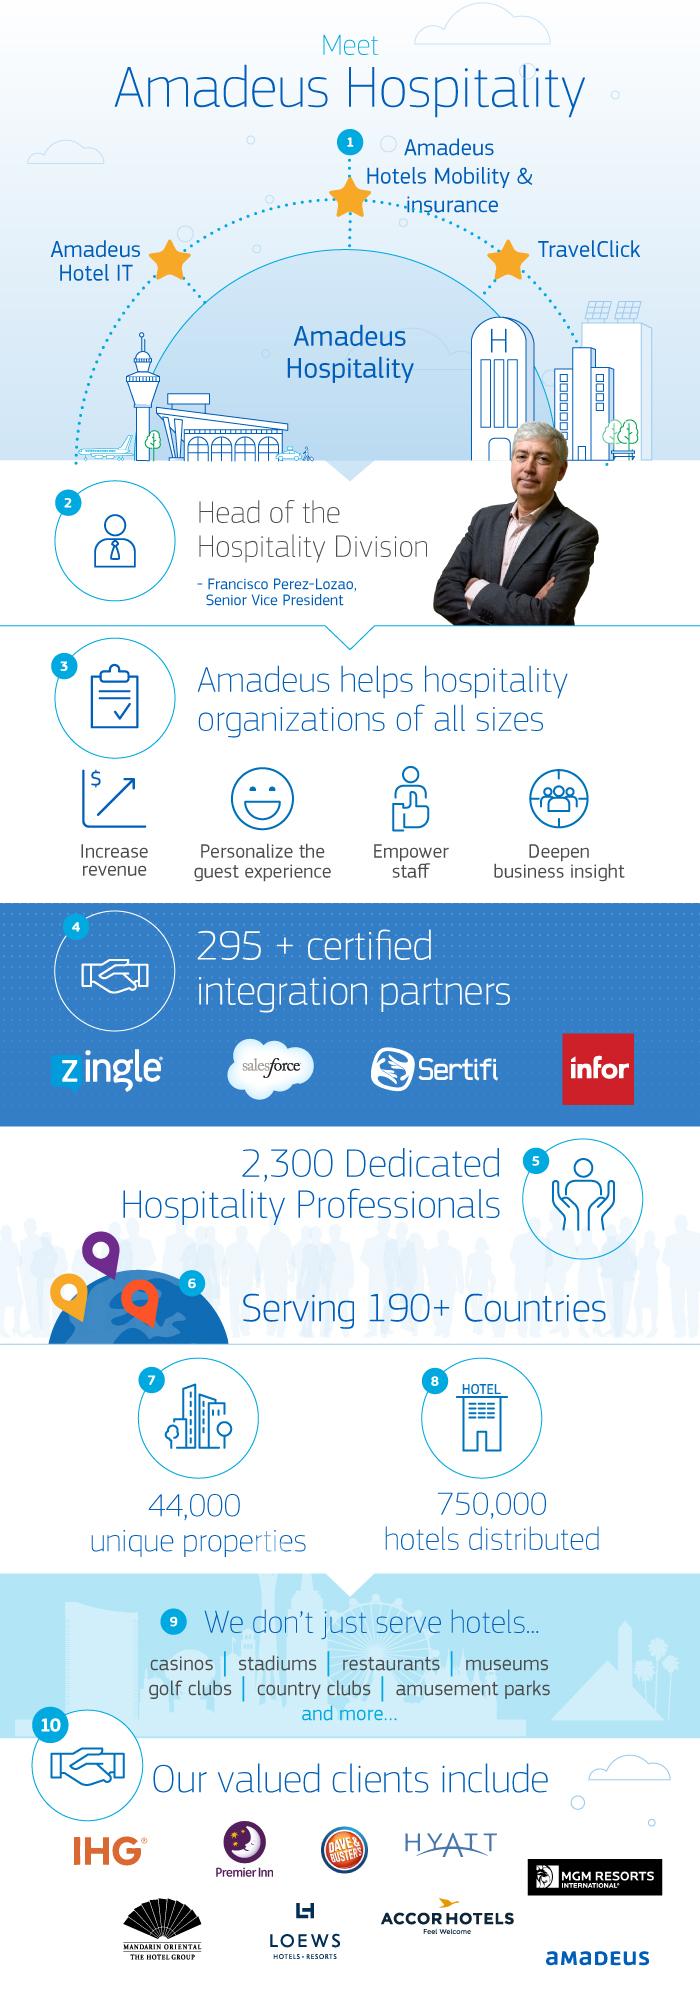 Meet Amadeus Hospitality